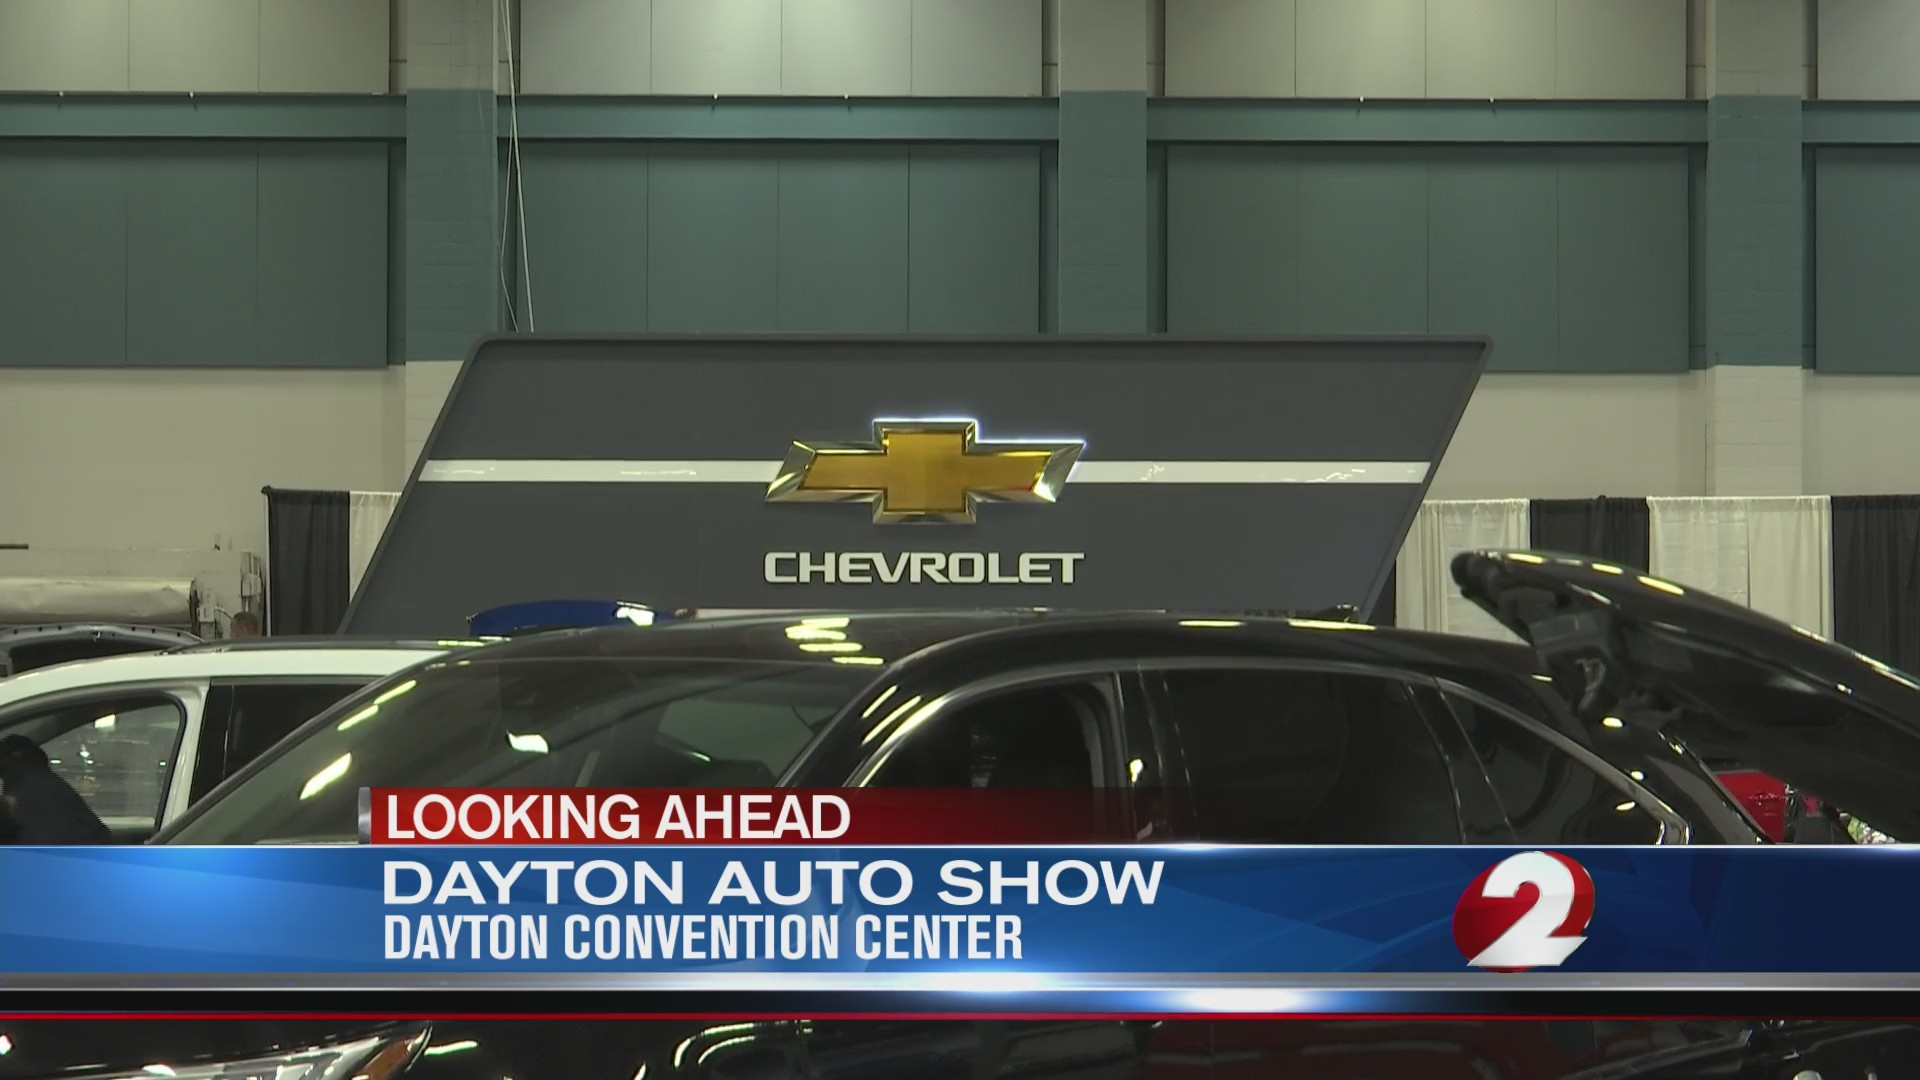 Dayton Auto Show >> Dayton Auto Show To Feature Latest In Automotive Technology